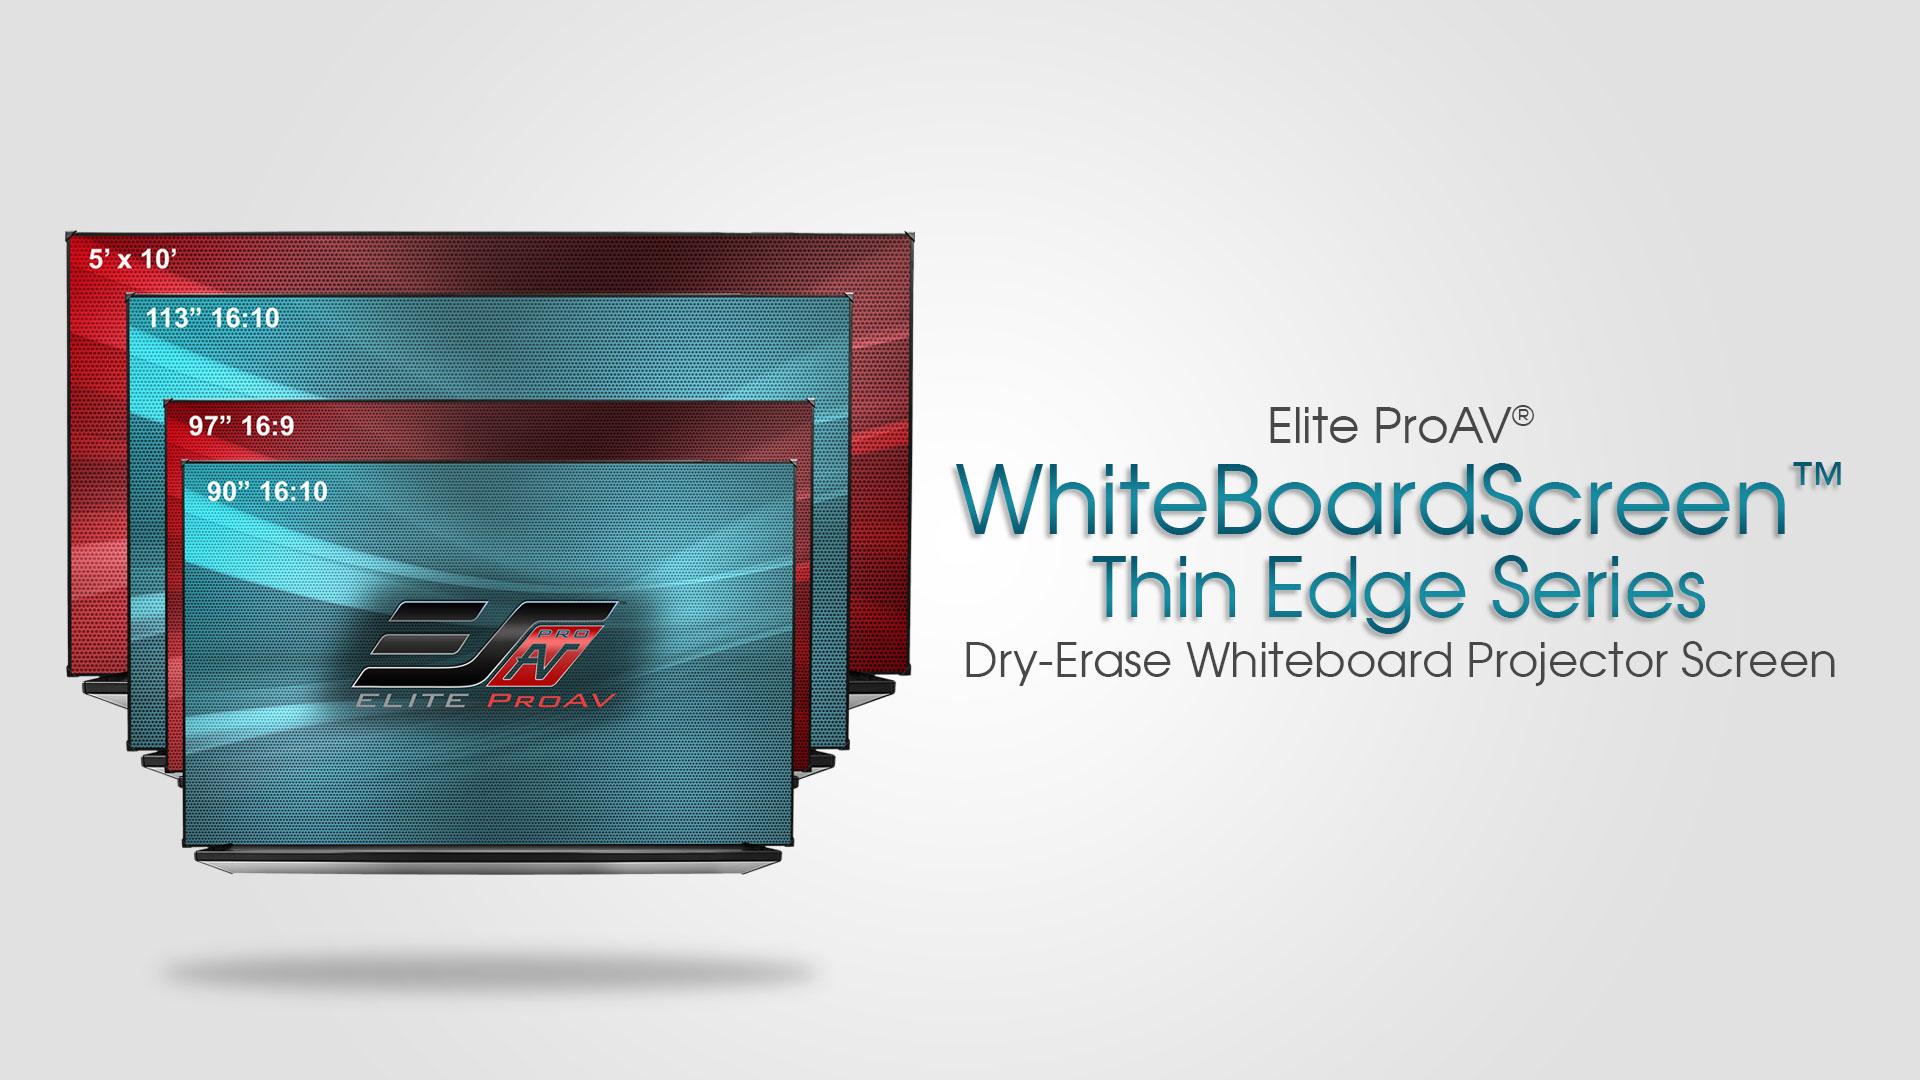 WhiteBoardScreen™ Thin Edge Series Product Video